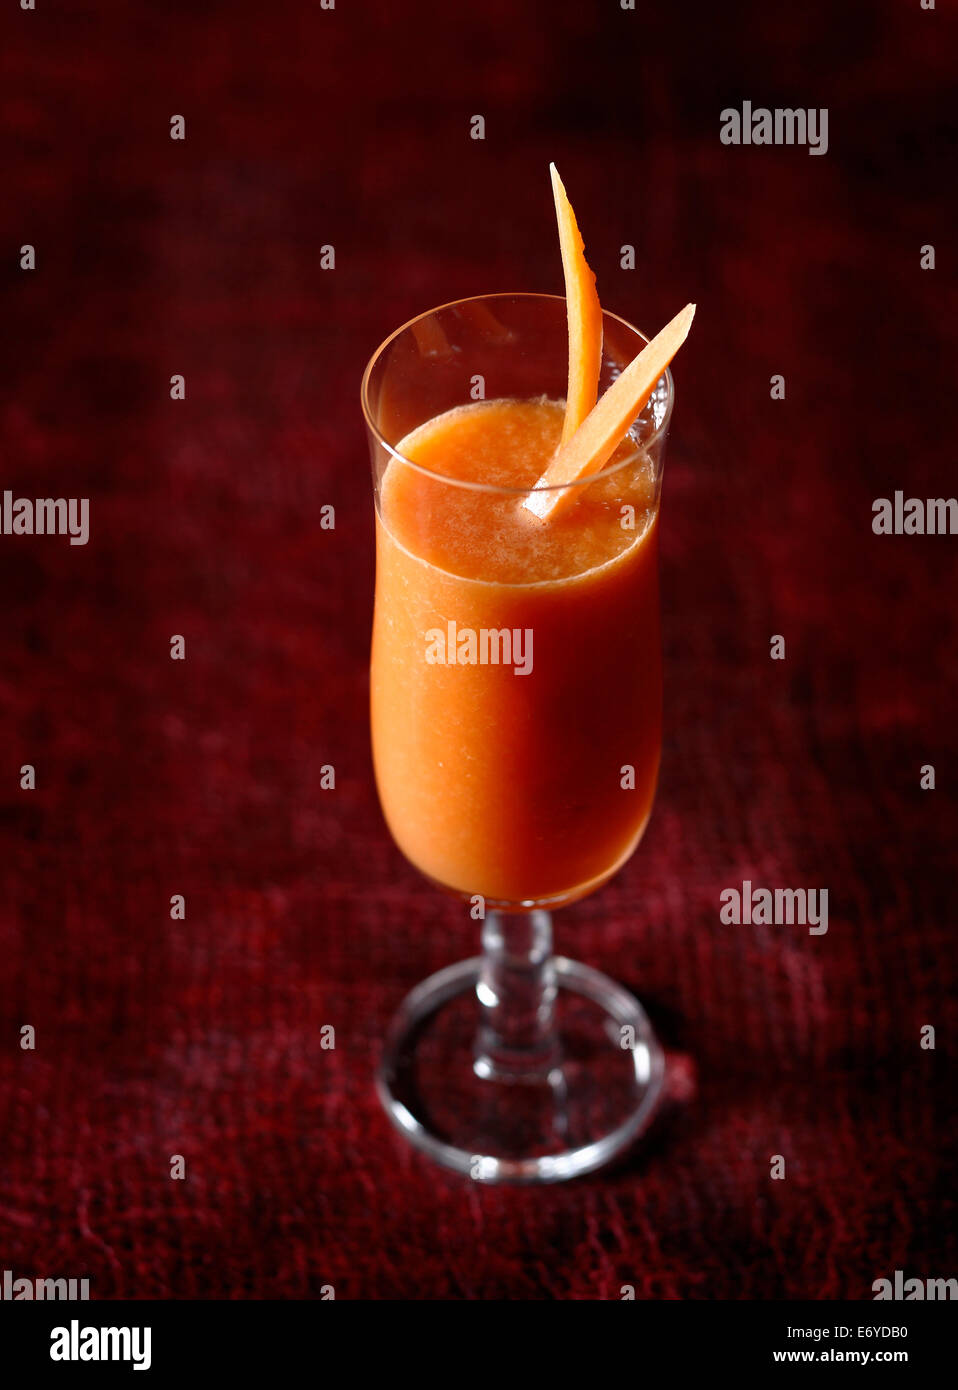 Carrot,melon and lemon juice - Stock Image